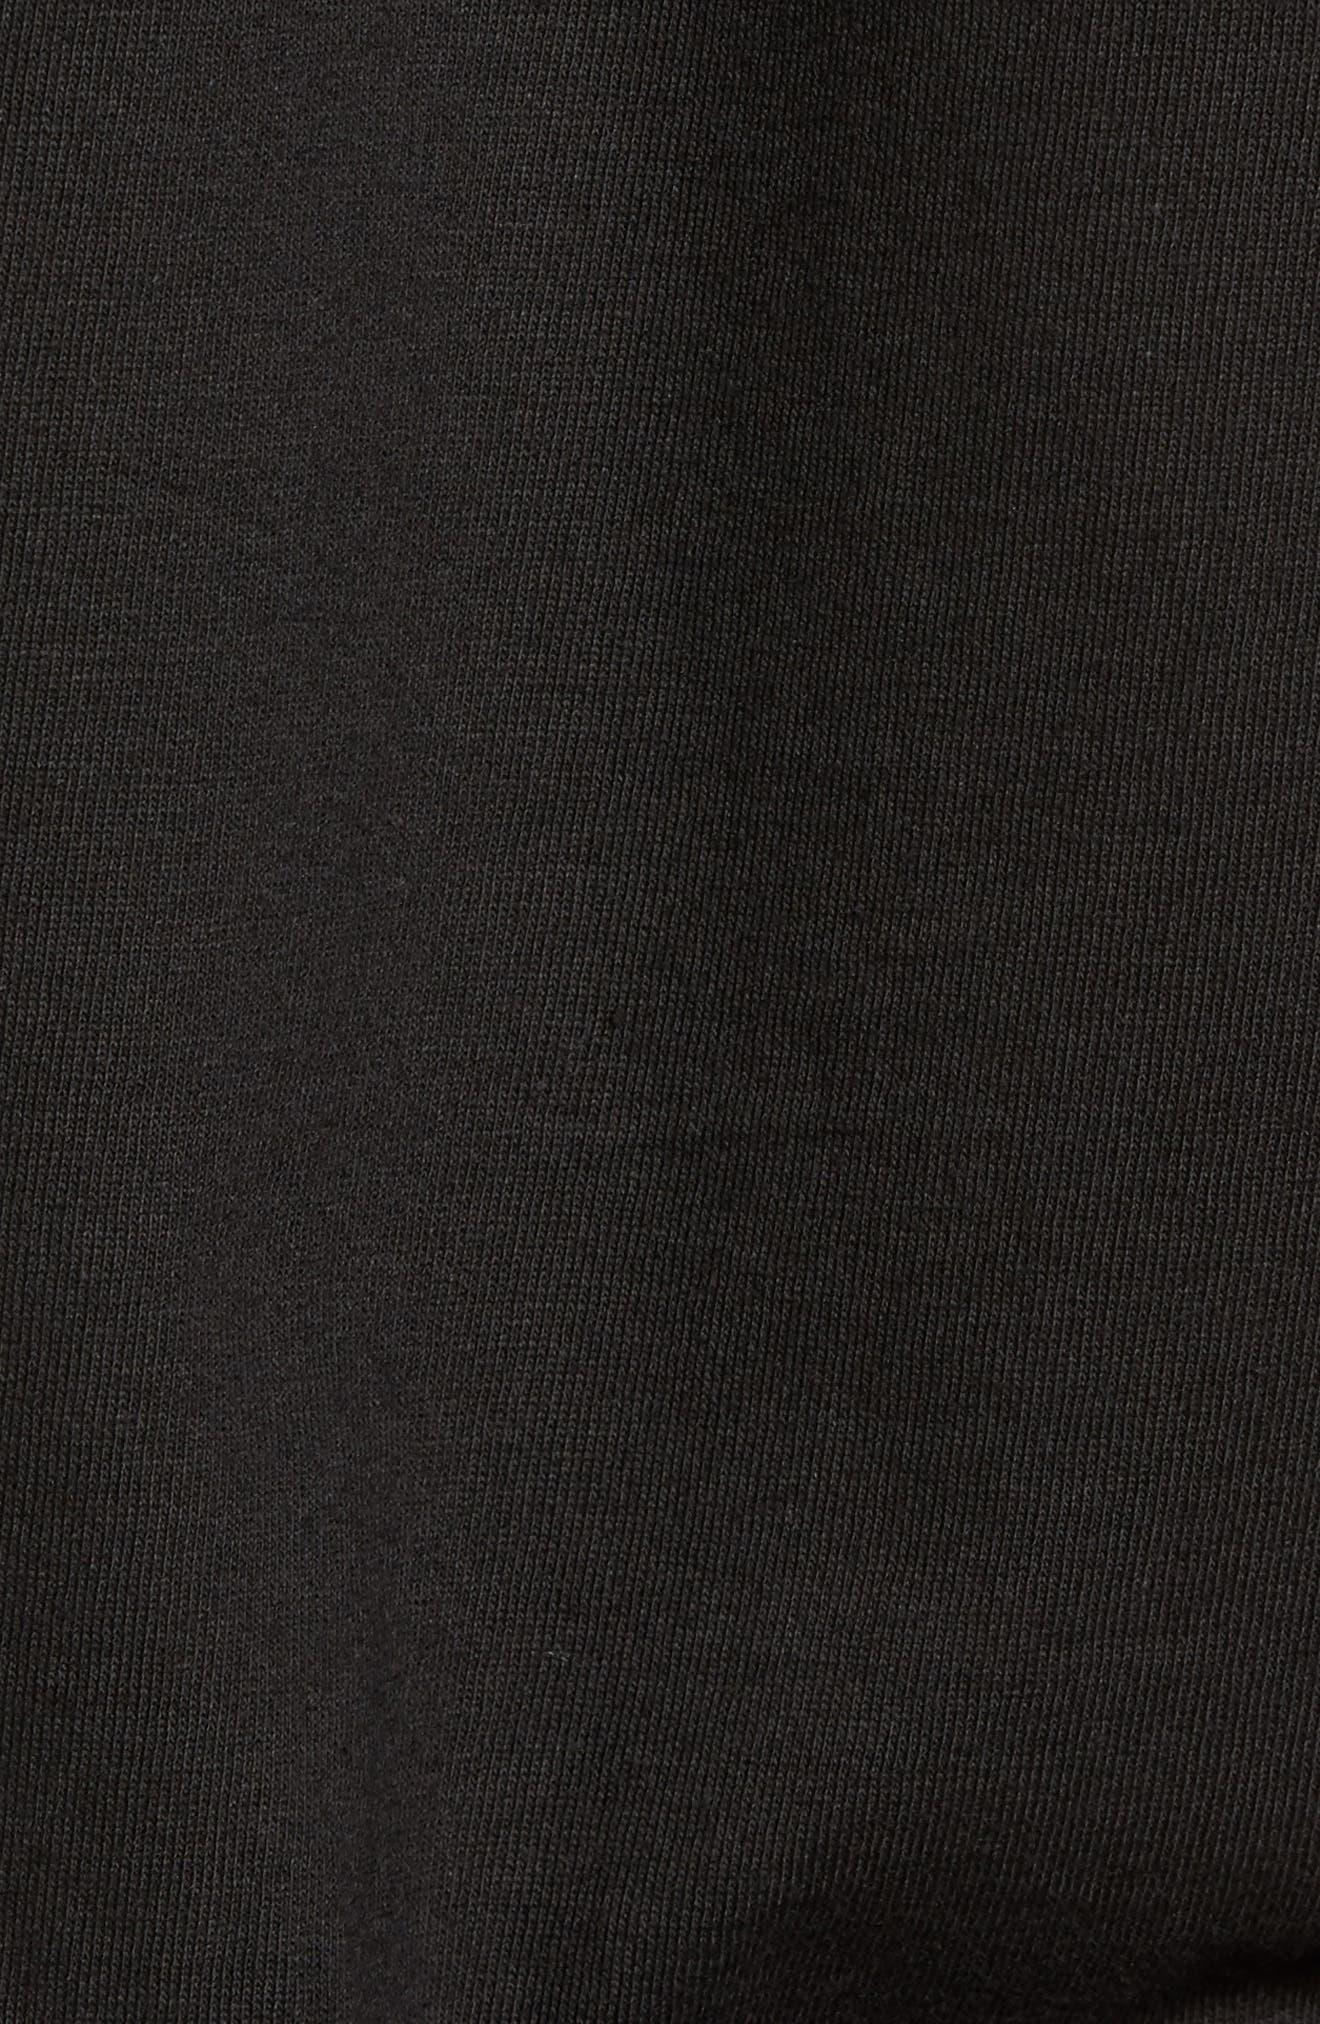 Peabody Standard T-Shirt,                             Alternate thumbnail 5, color,                             001